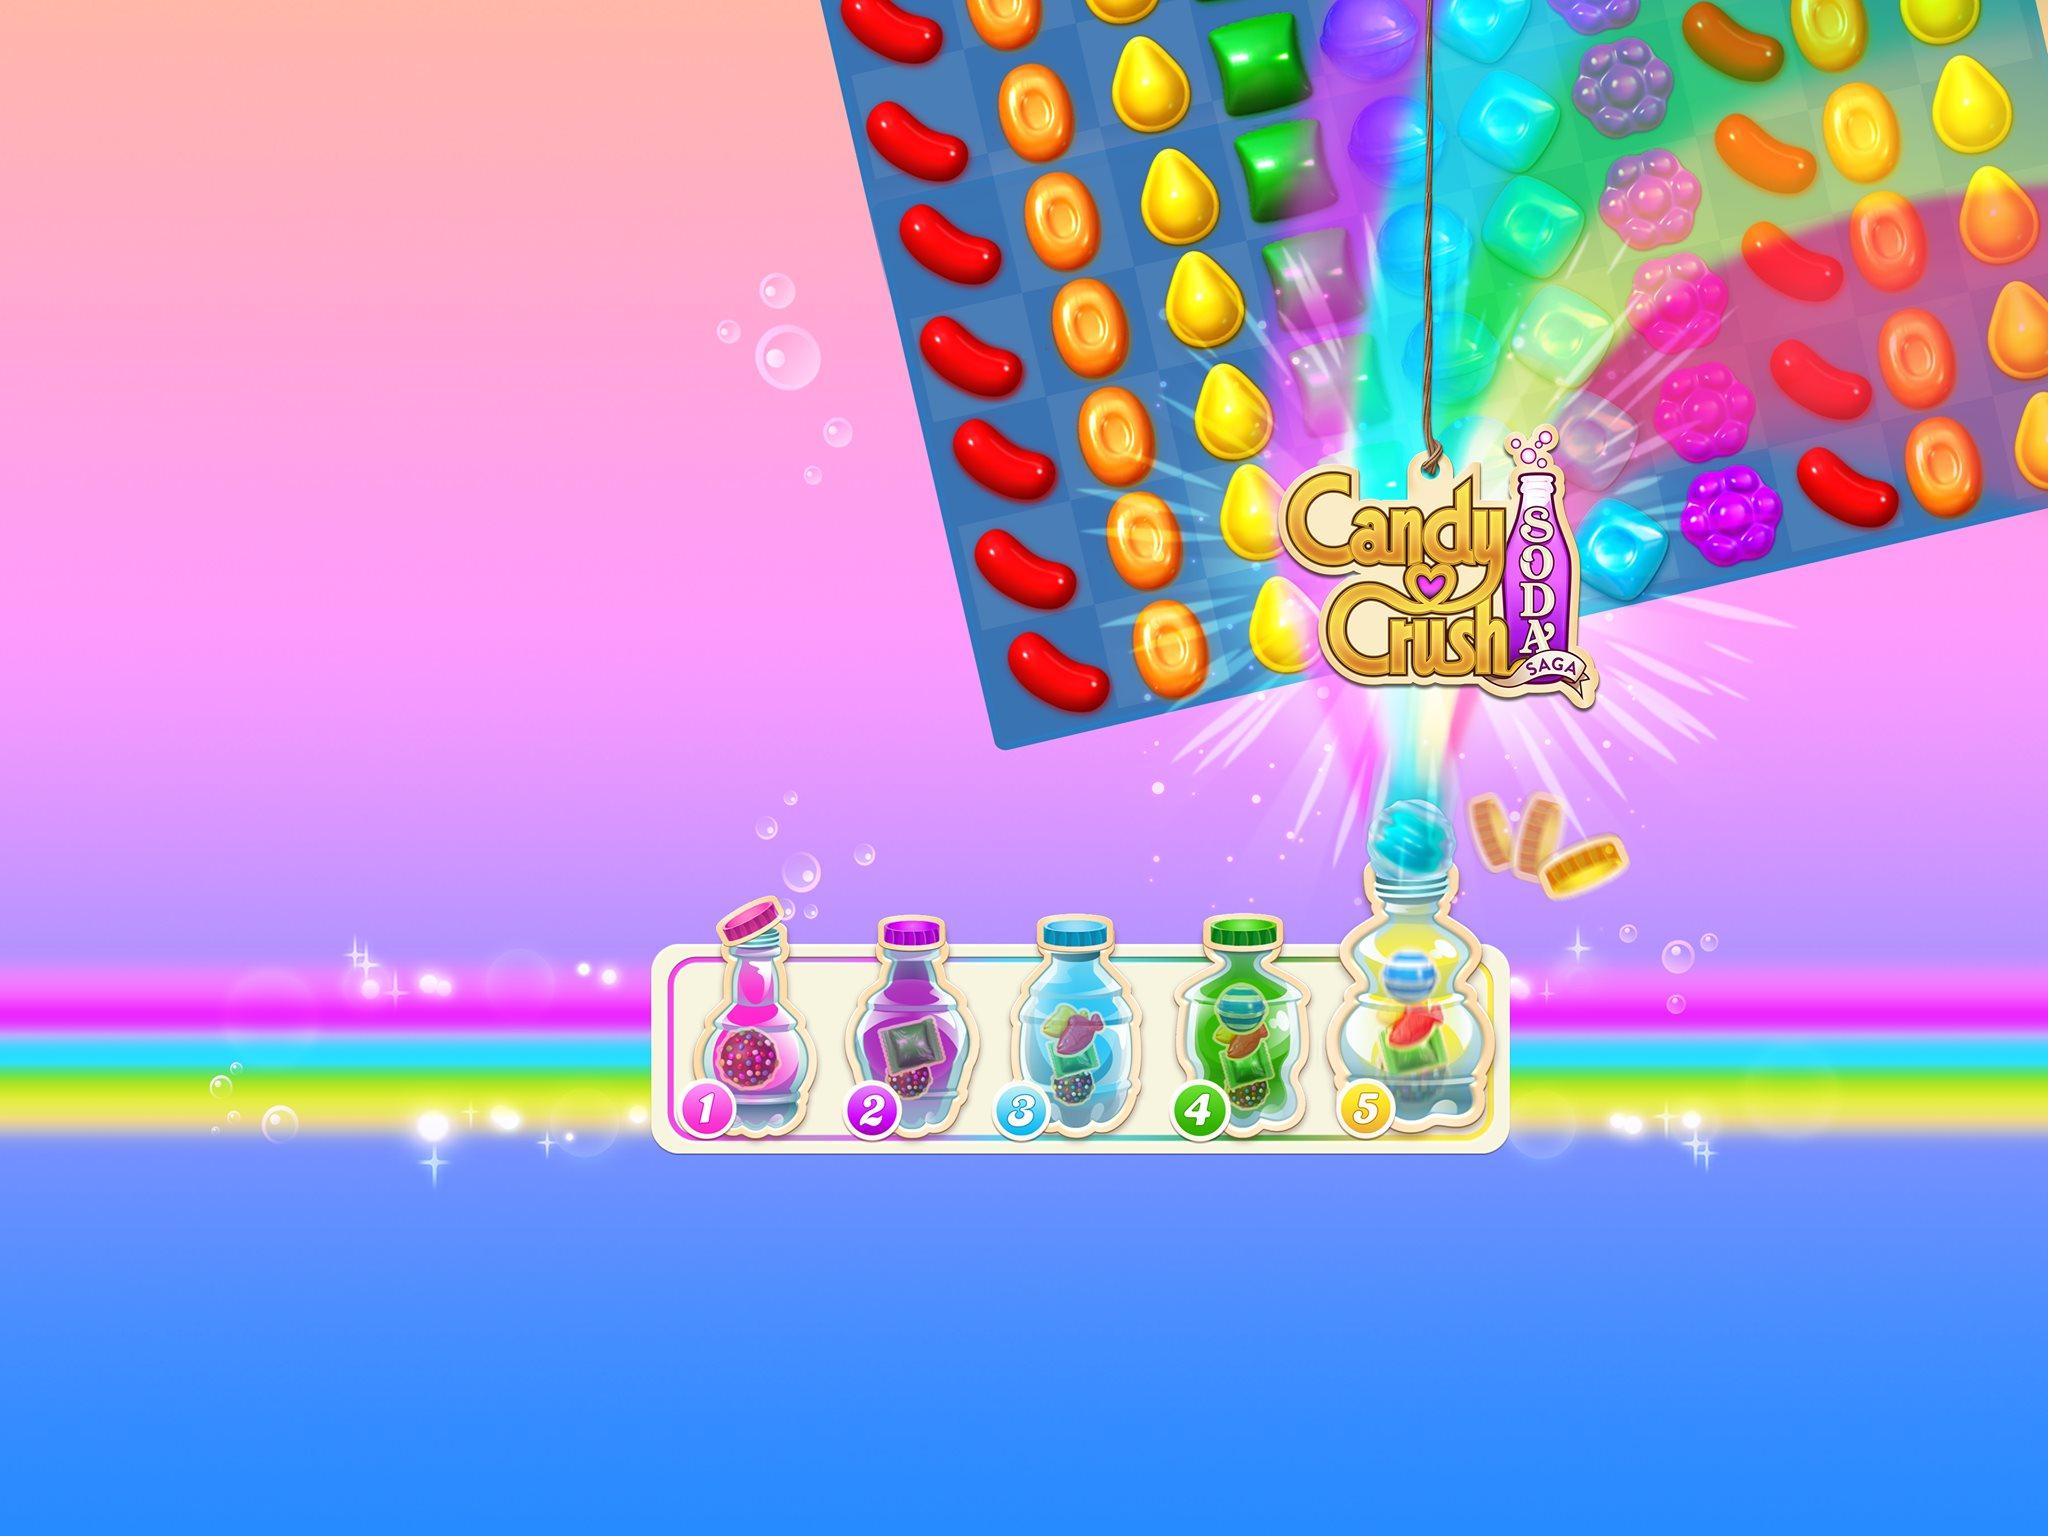 Candy Crush Soda Win Streak